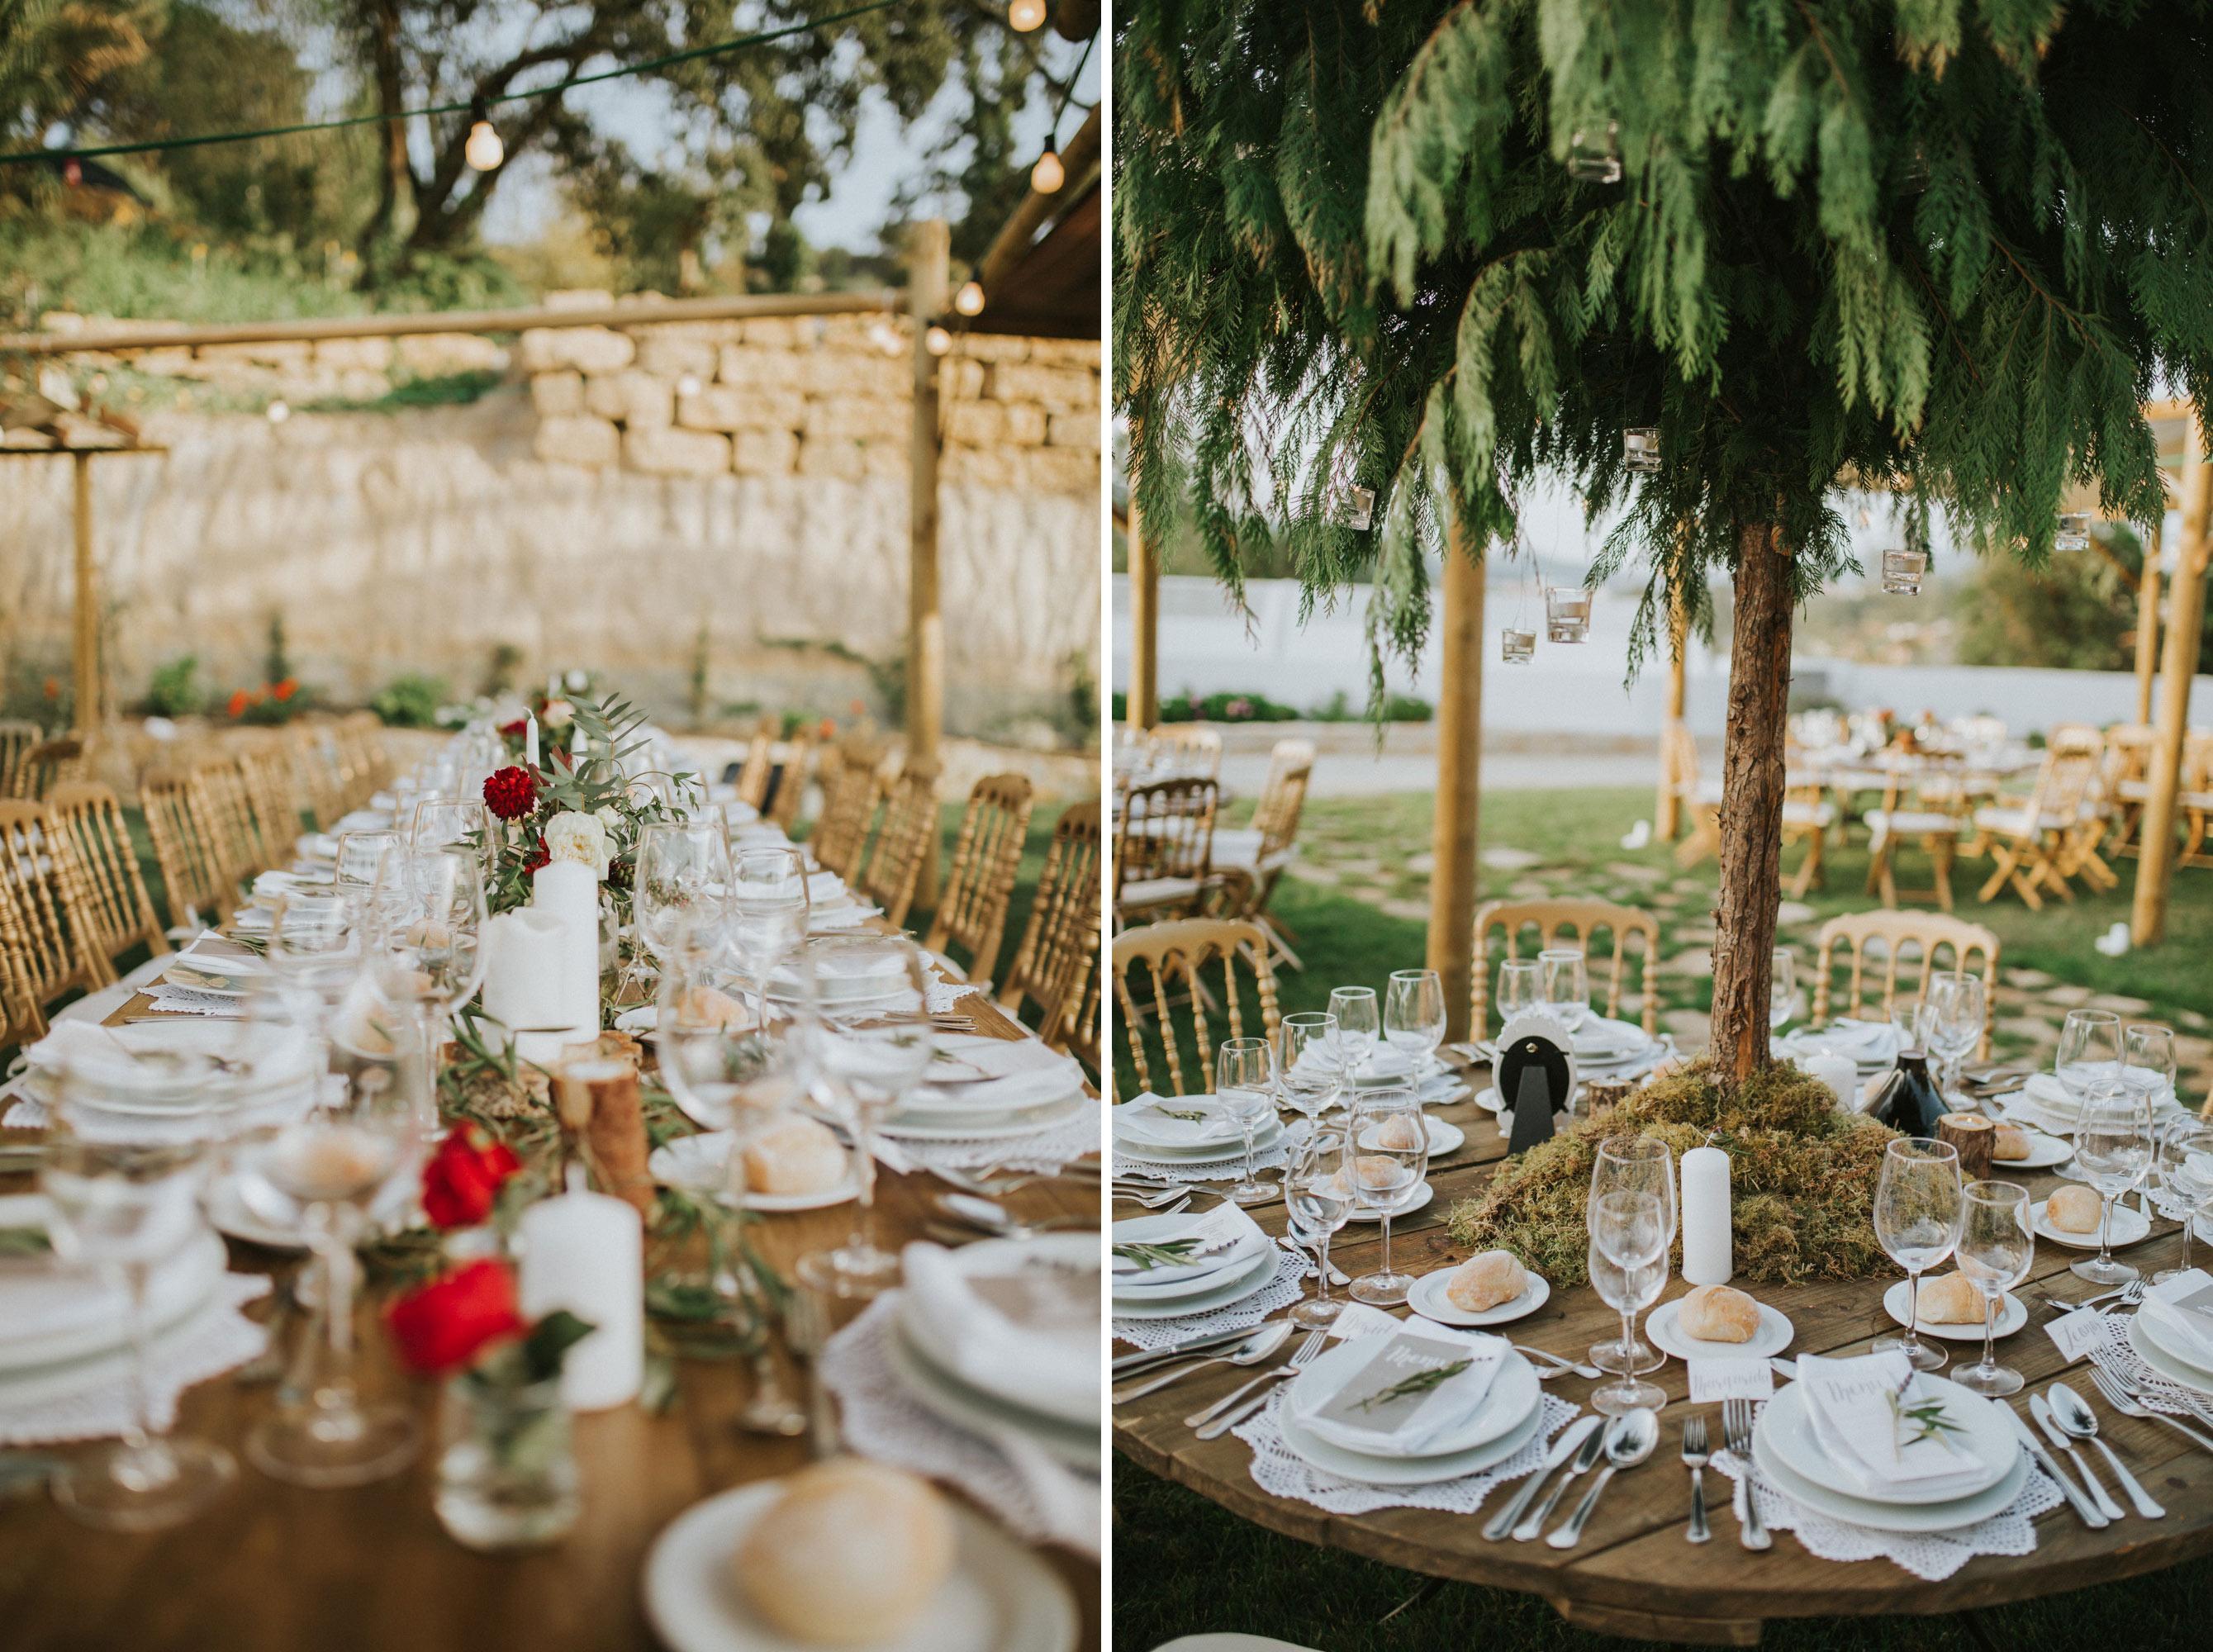 068-carina-e-samuel-wedding-casamento-quinta-dos-rouxinois-rustico-my-fancy-wedding-mafra-malveira-lisboa-sintra-cascais-filipe-santiago-fotografia-fotografo-lifestyle-destination-portugal